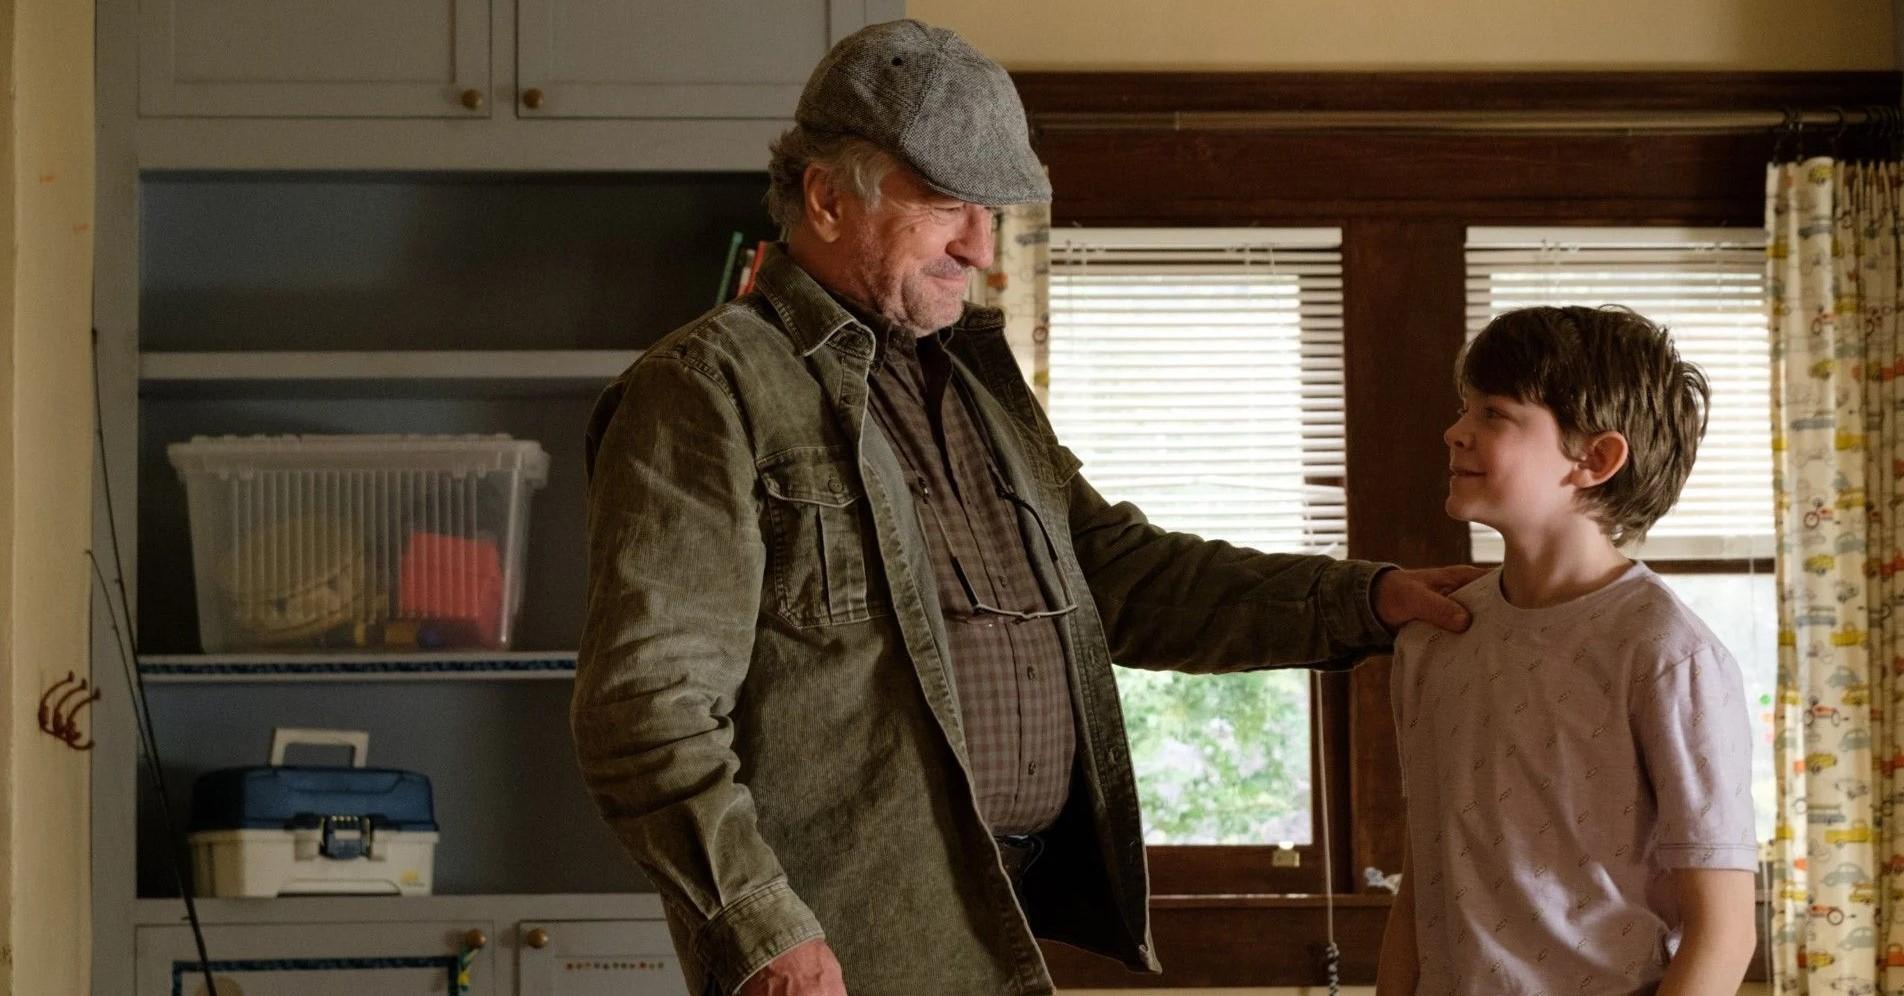 The War With Grandpa Robert De Niro and Oakes Fegley